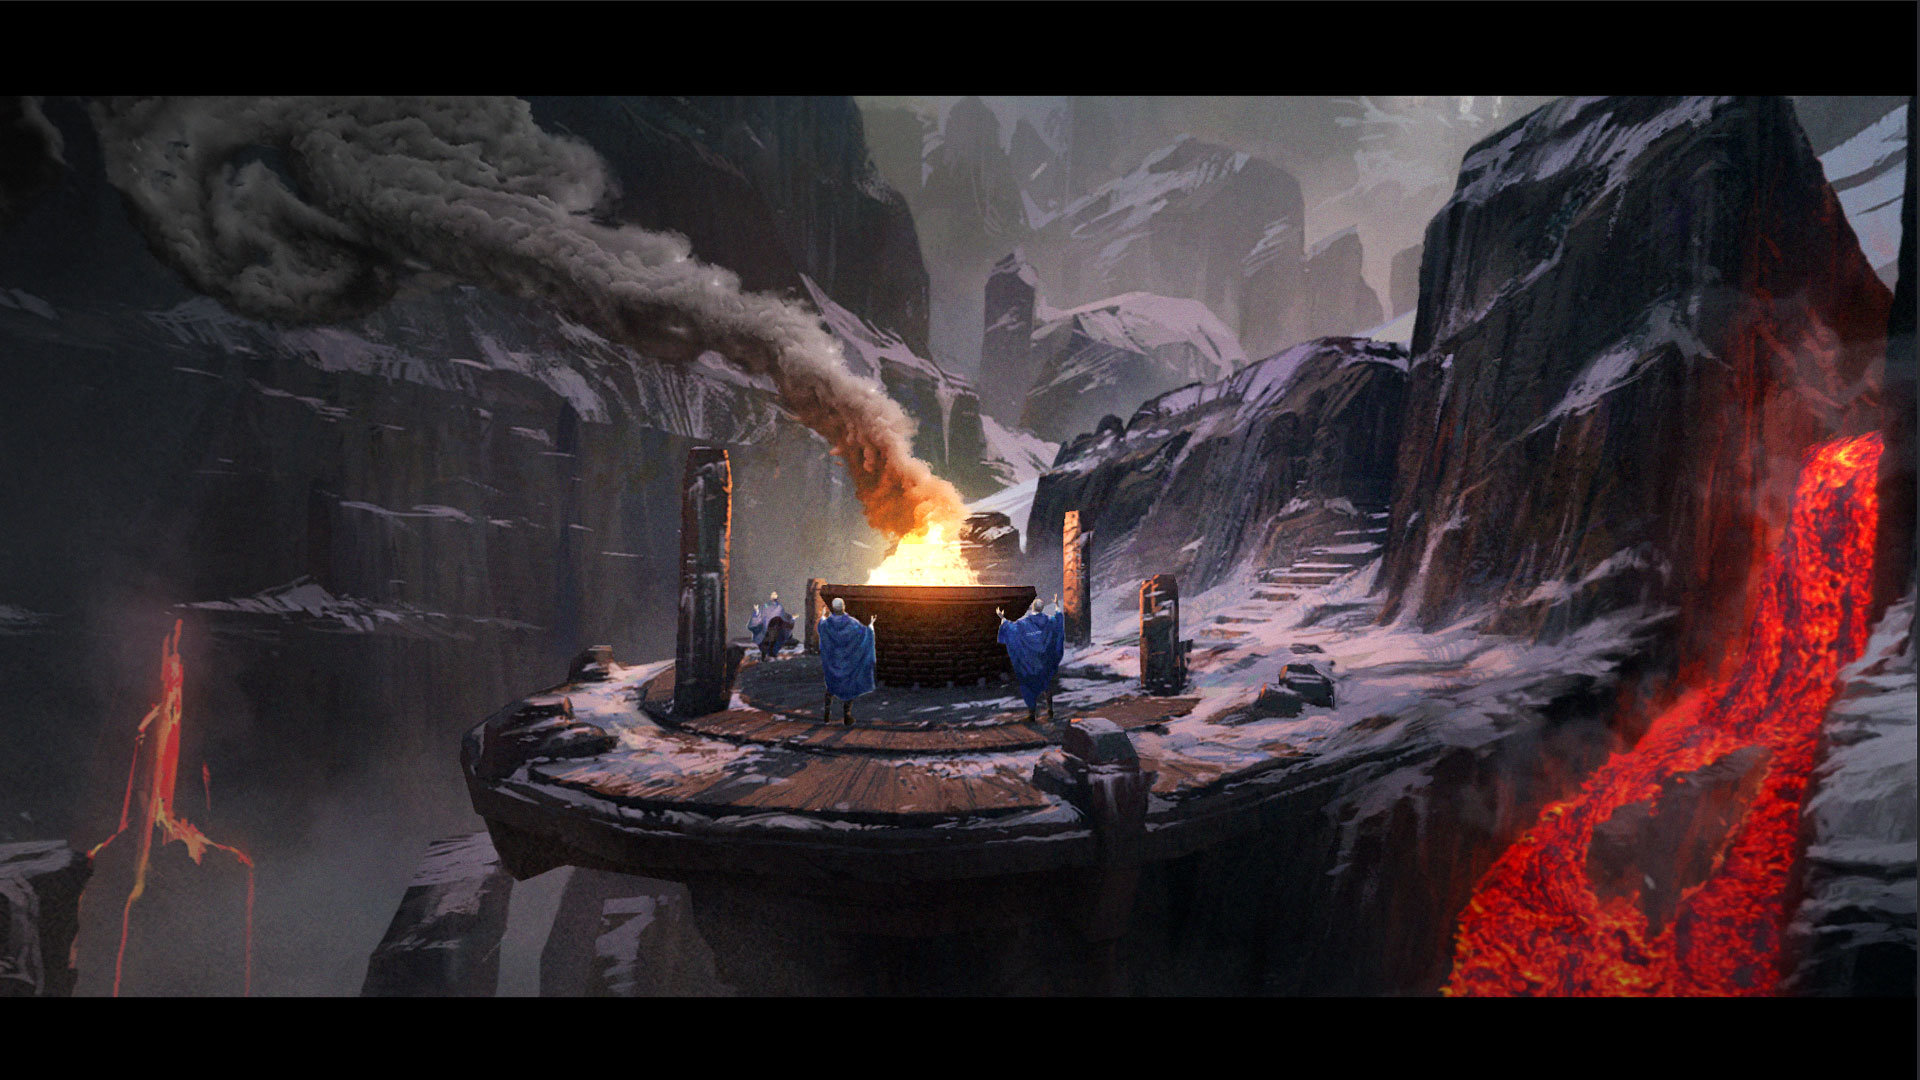 Jakub javora fireplace still javoraj